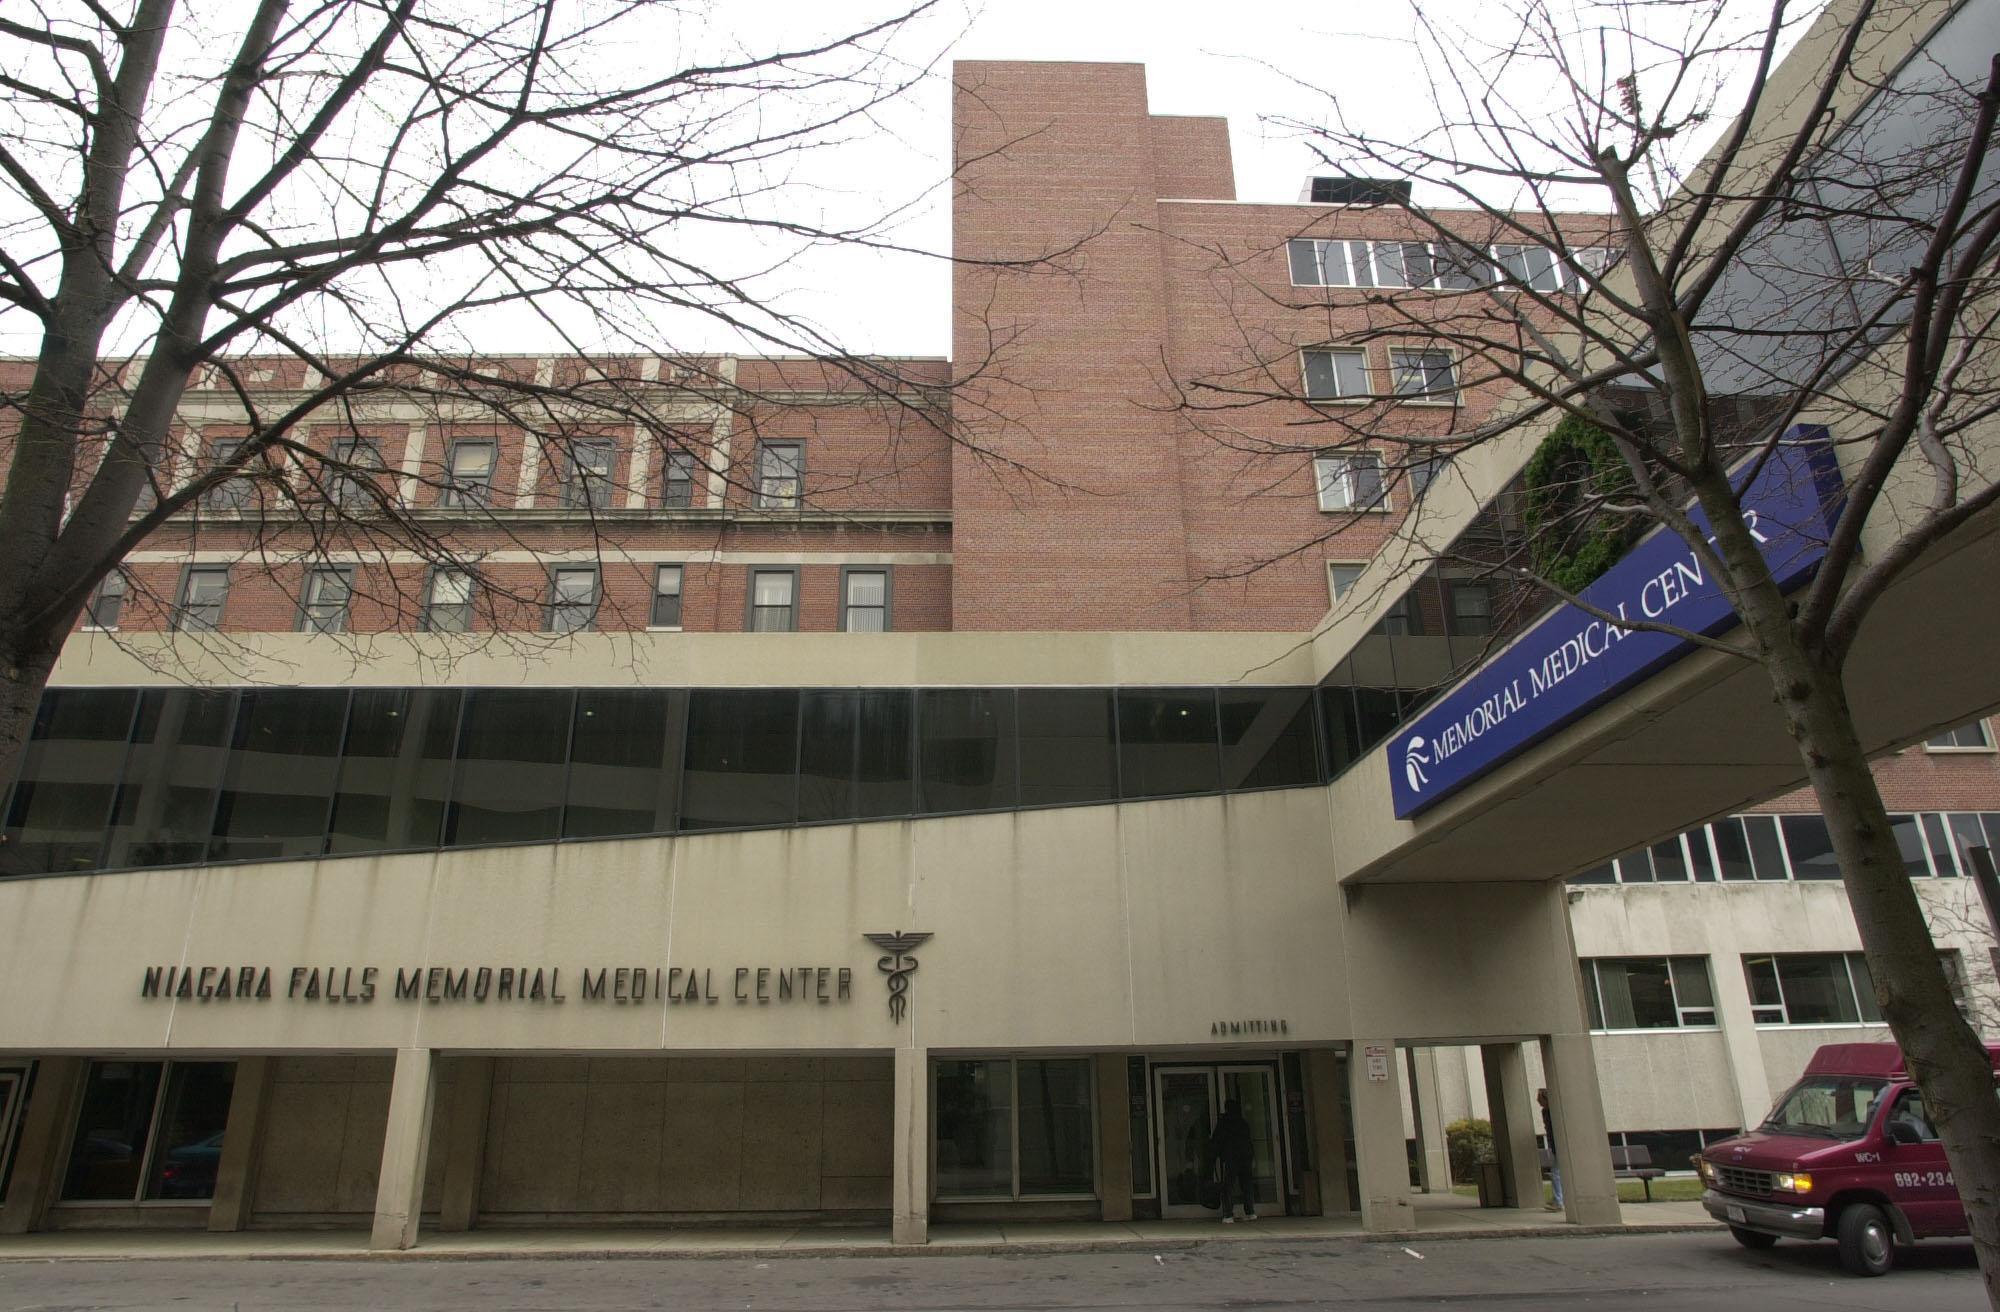 Niagara Falls Memorial Medical Center is participating in a clinical trial. (Buffalo News file photo)